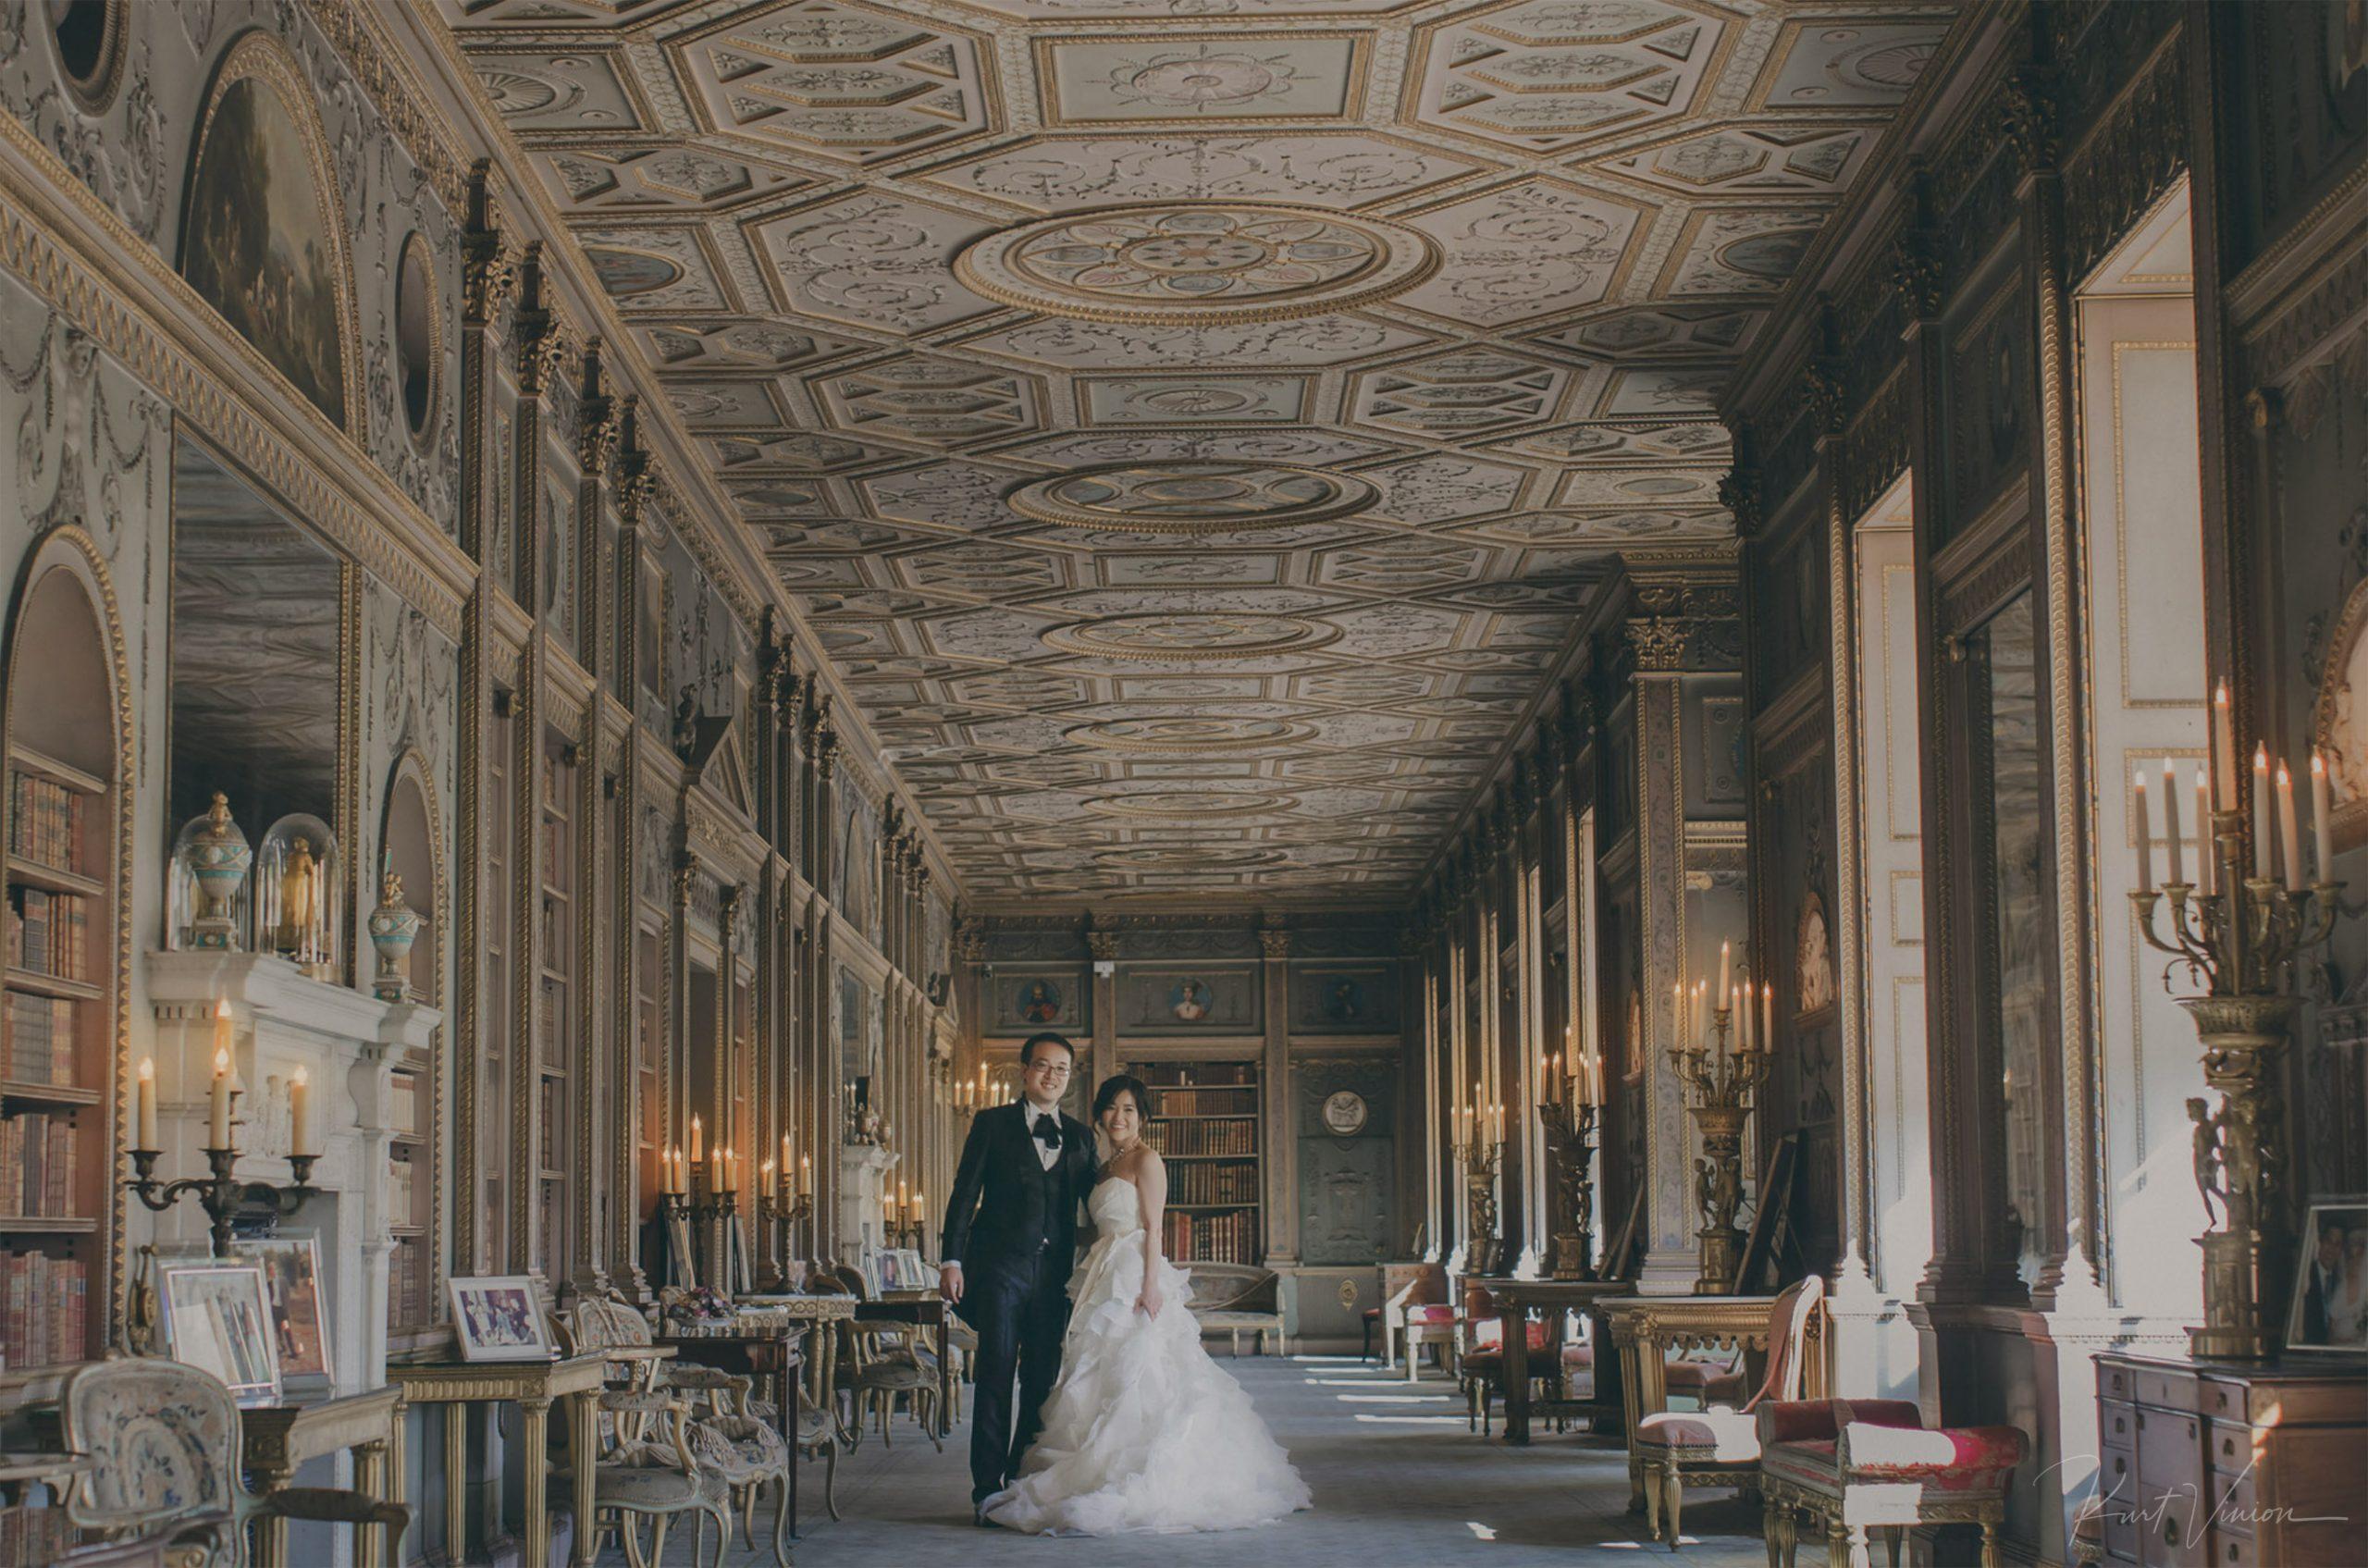 Prague-Wedding-Photographer-Kurt-Vinion-8